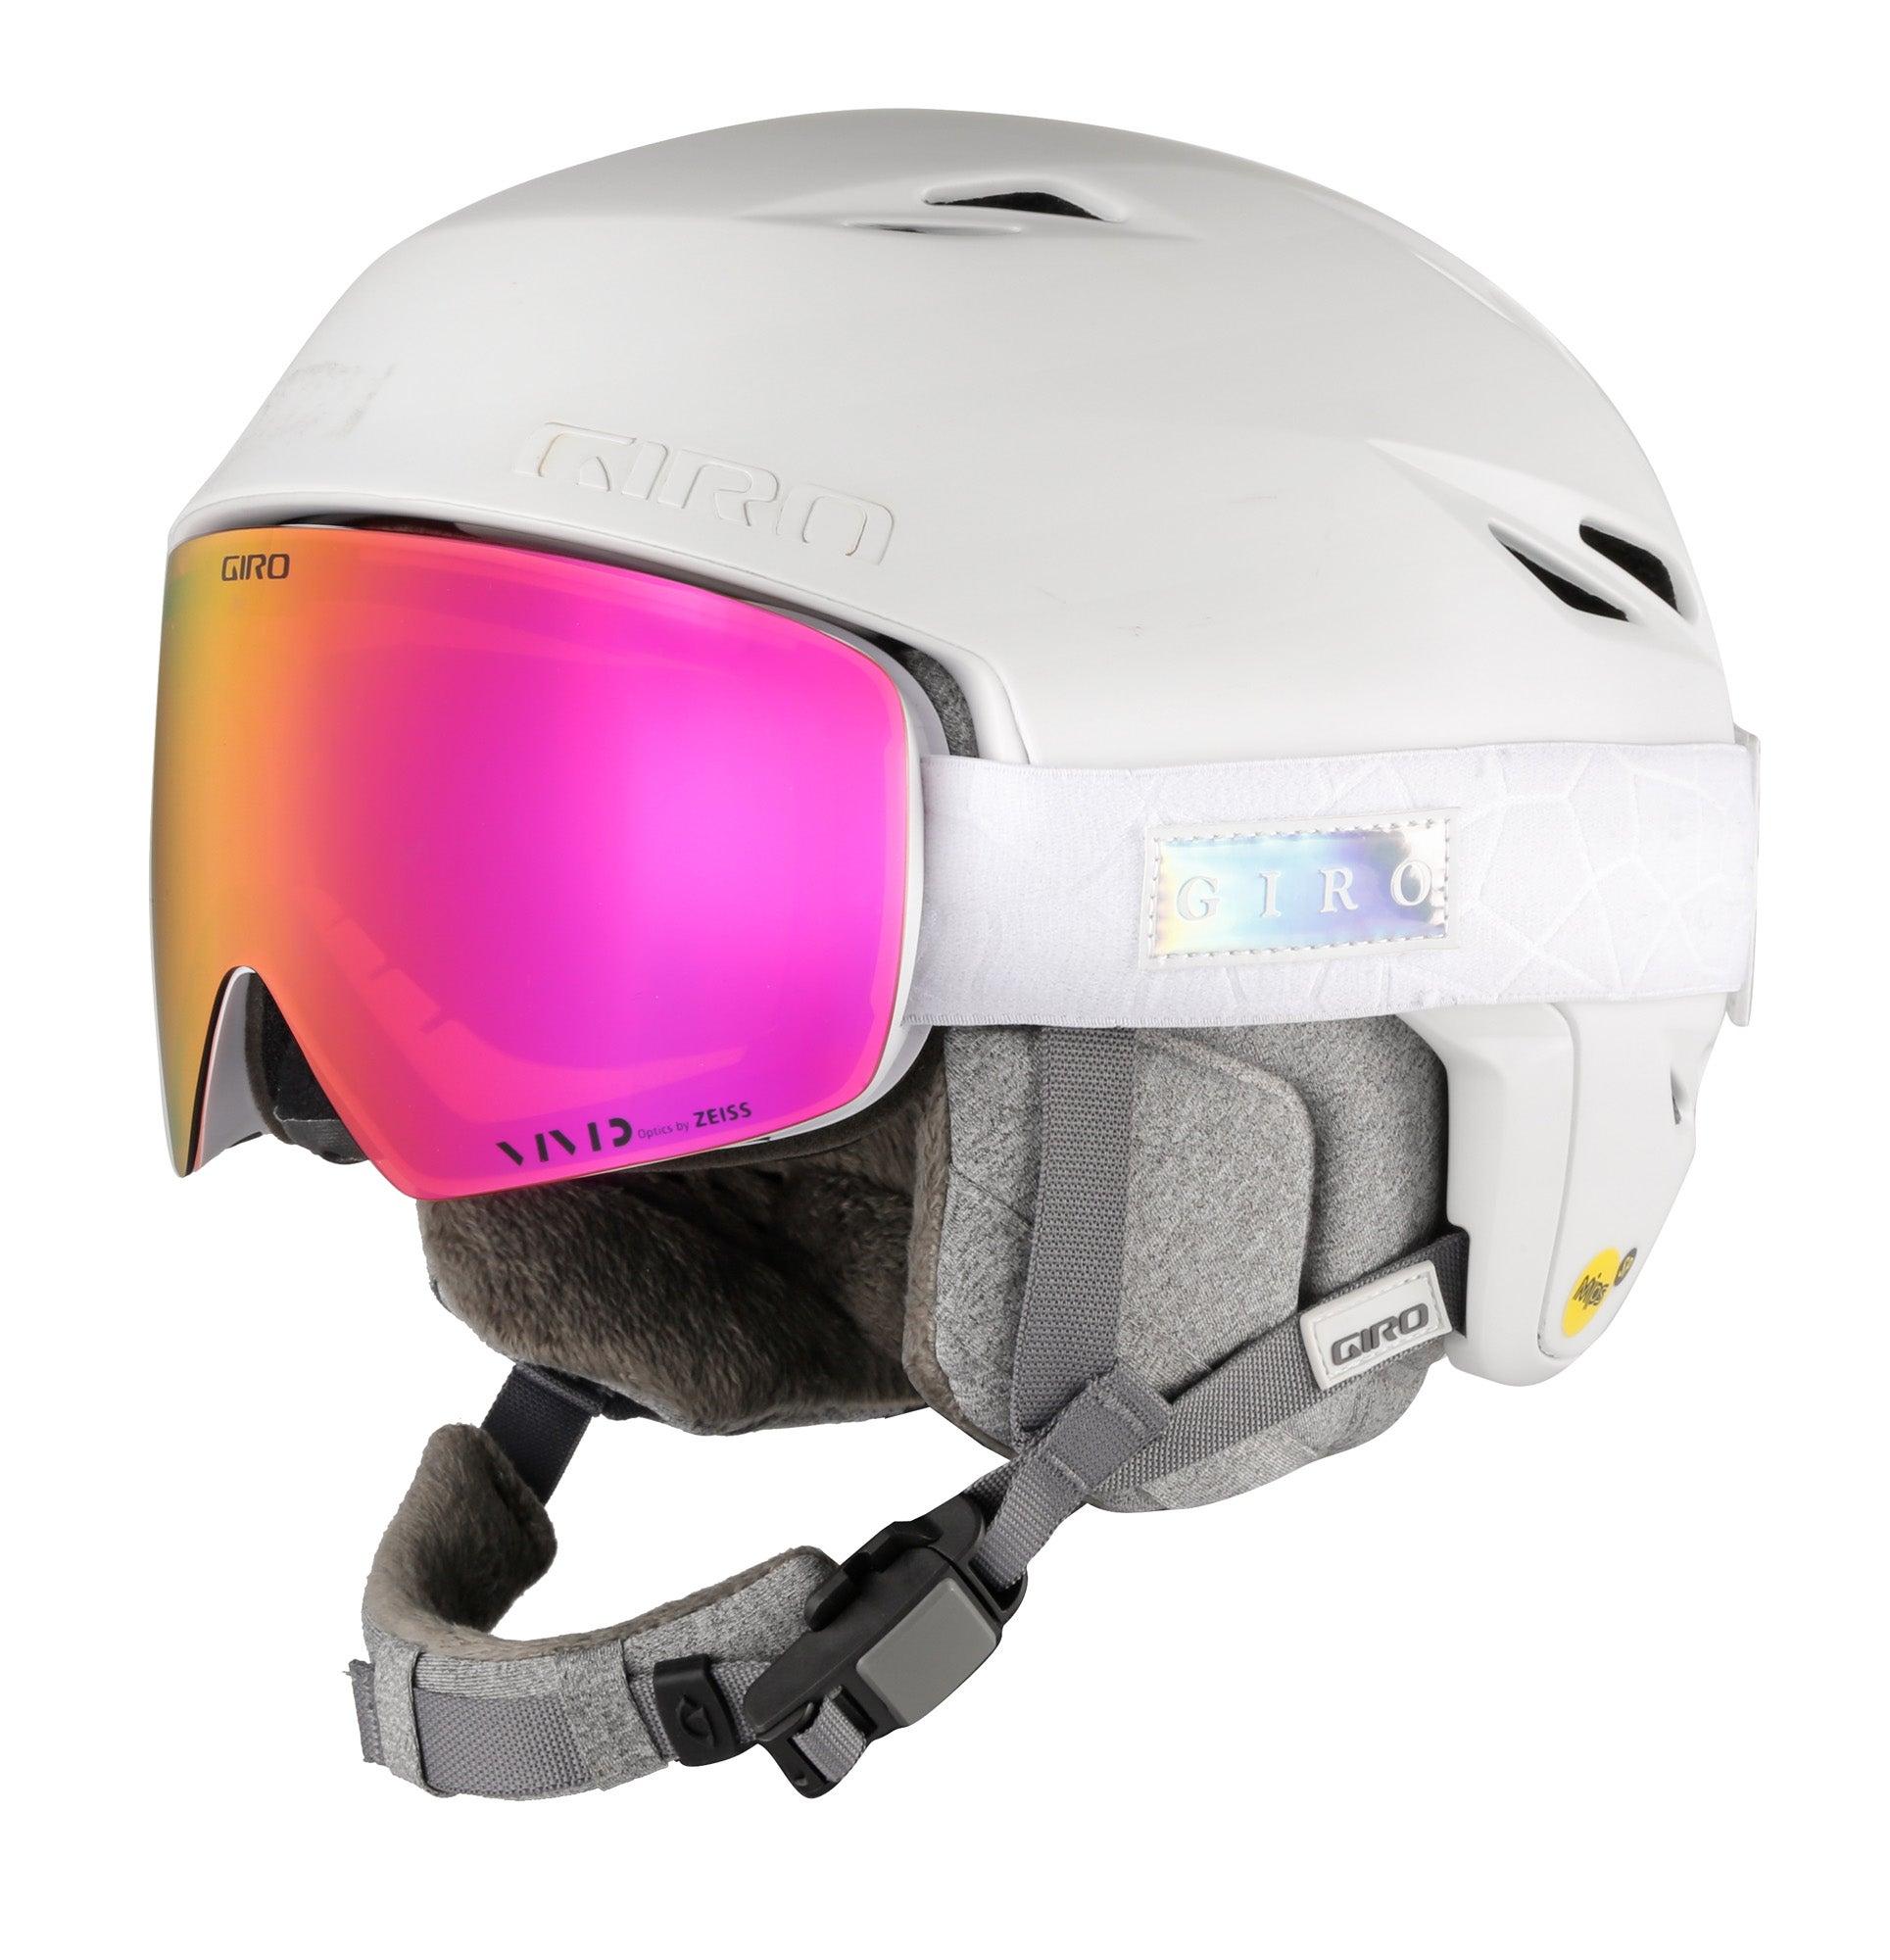 Giro Grid/Envi MIPS Helmet and Contour Goggle